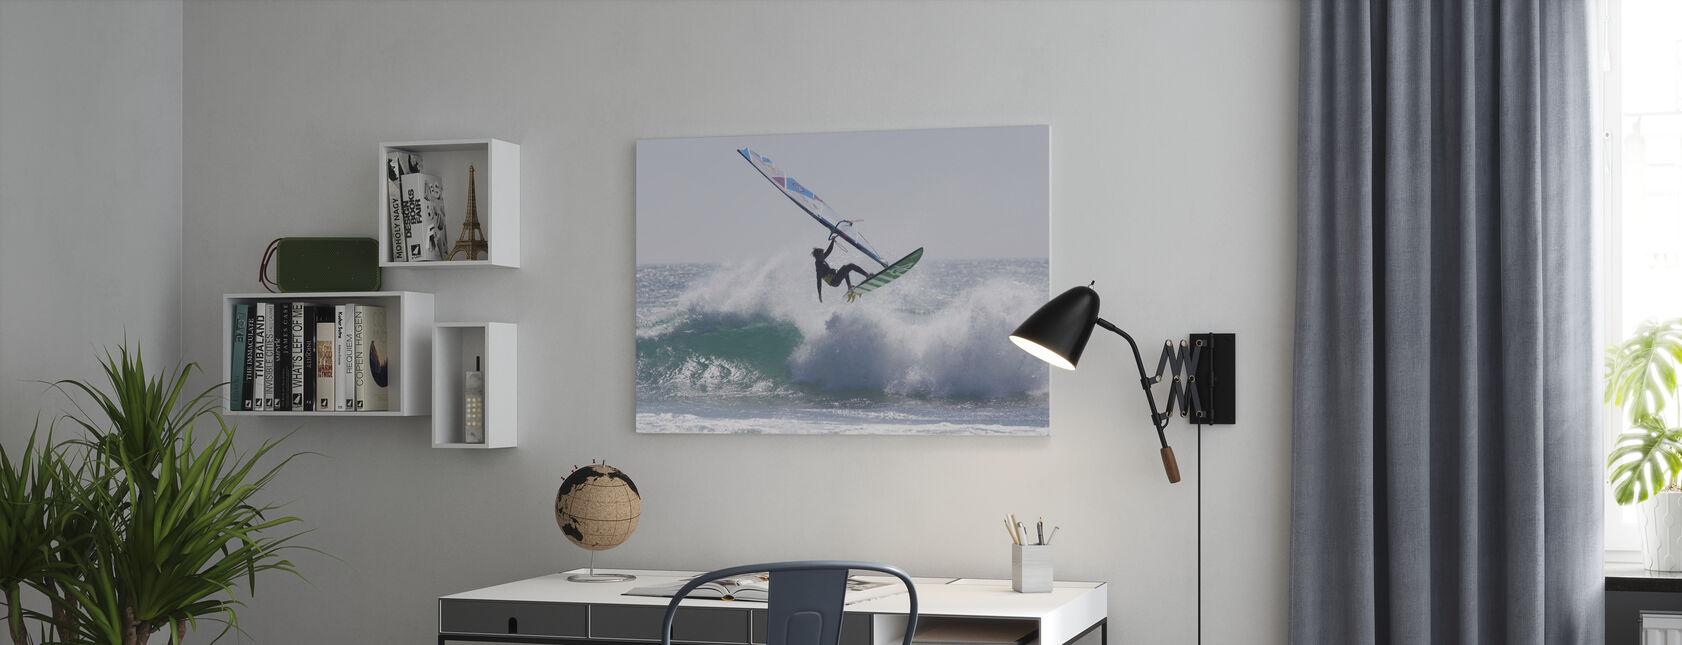 Windsurfing Jump - Canvas print - Office